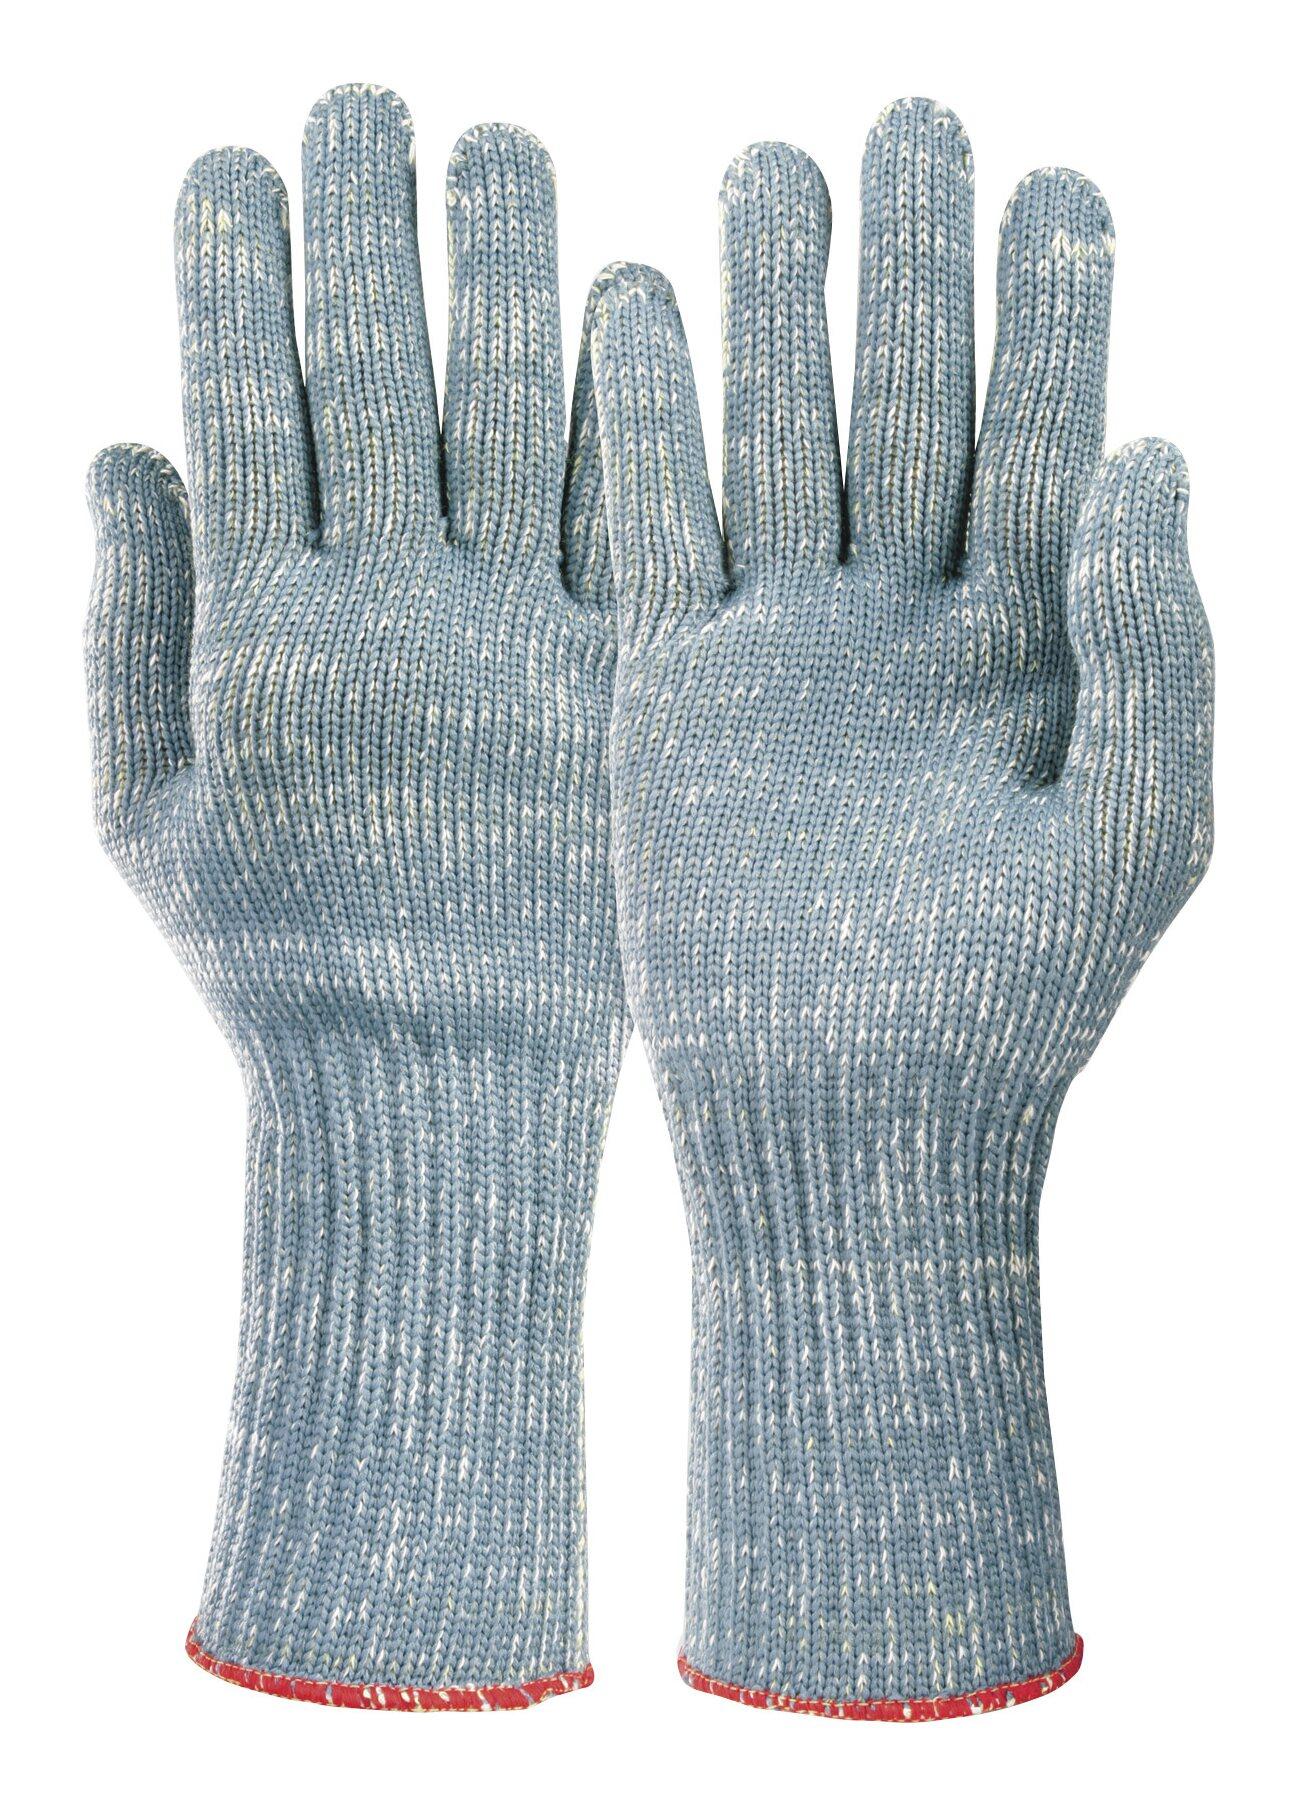 Honeywell Safety Honeywell KCL Handschuh Thermoplus 955, Größe 9 - 95509 (VPE: 1 Paar)